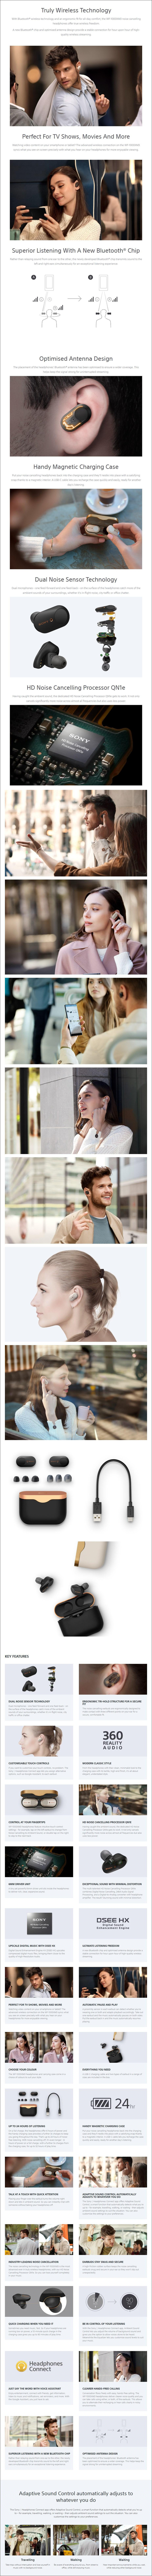 Sony WF-1000XM3 True Wireless NC Headphones - Black - Overview 1